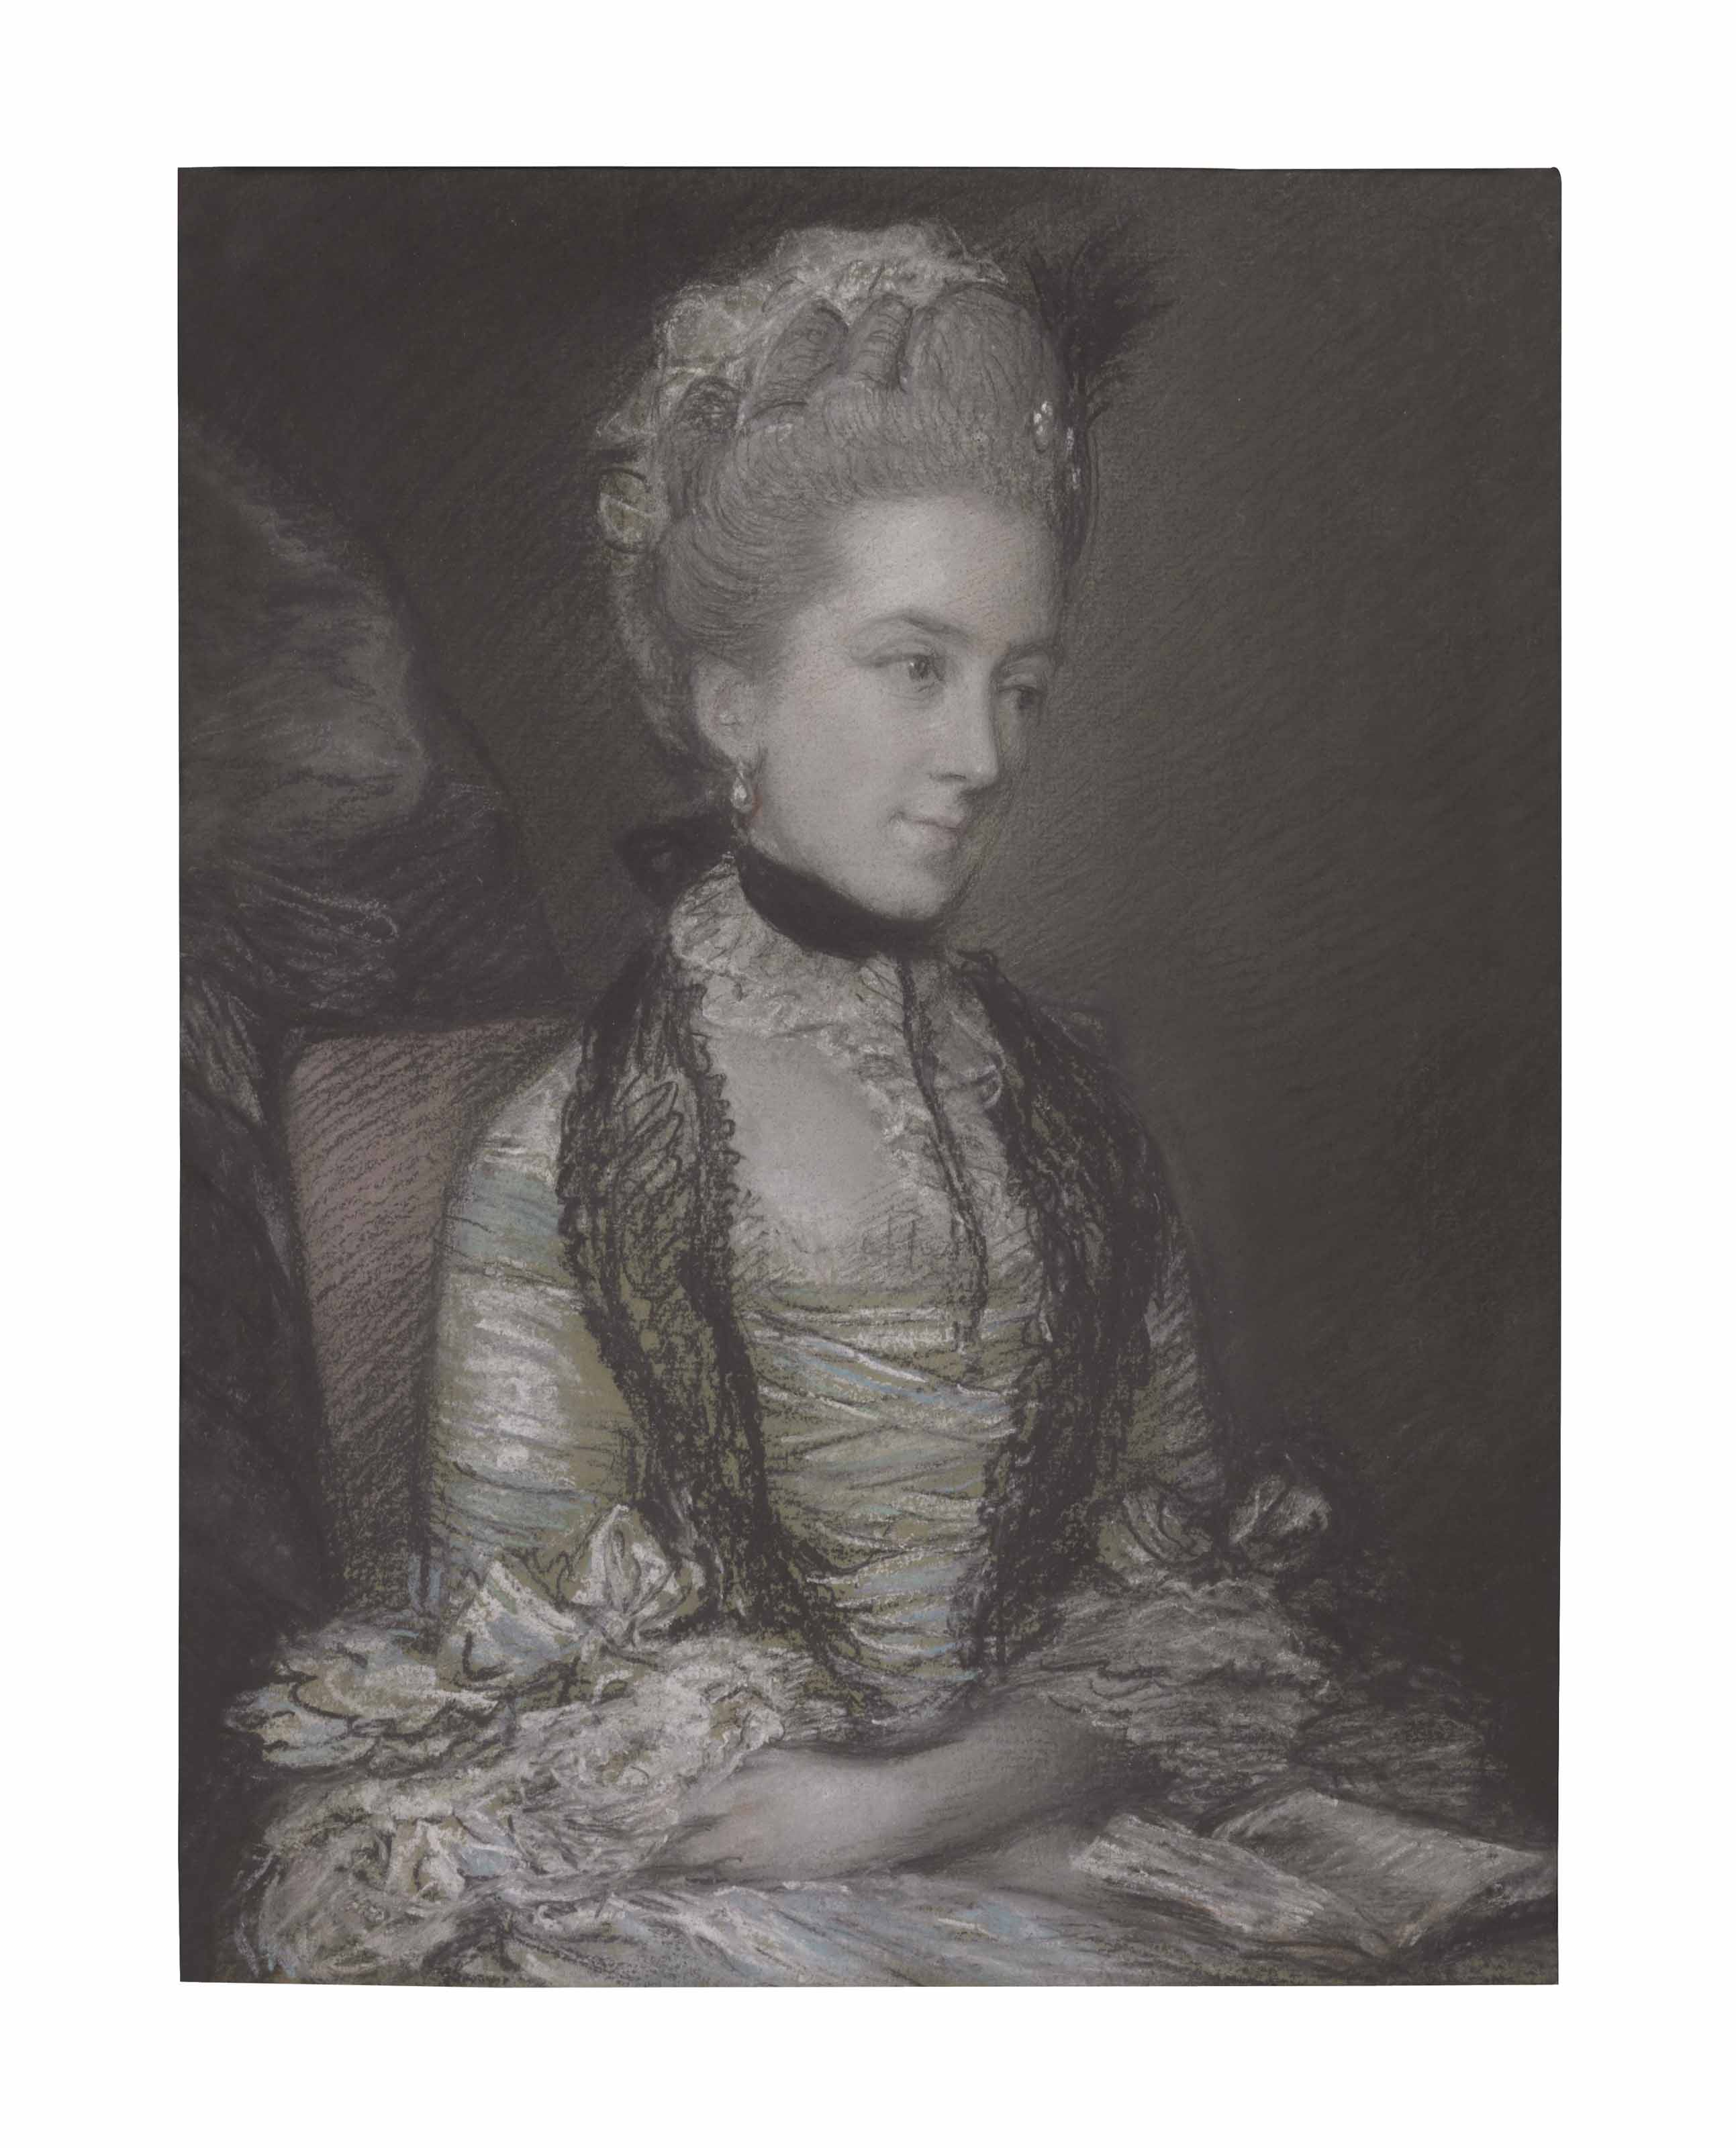 Portrait of Caroline, 4th Duchess of Marlborough, half-length, in a blue and white dress